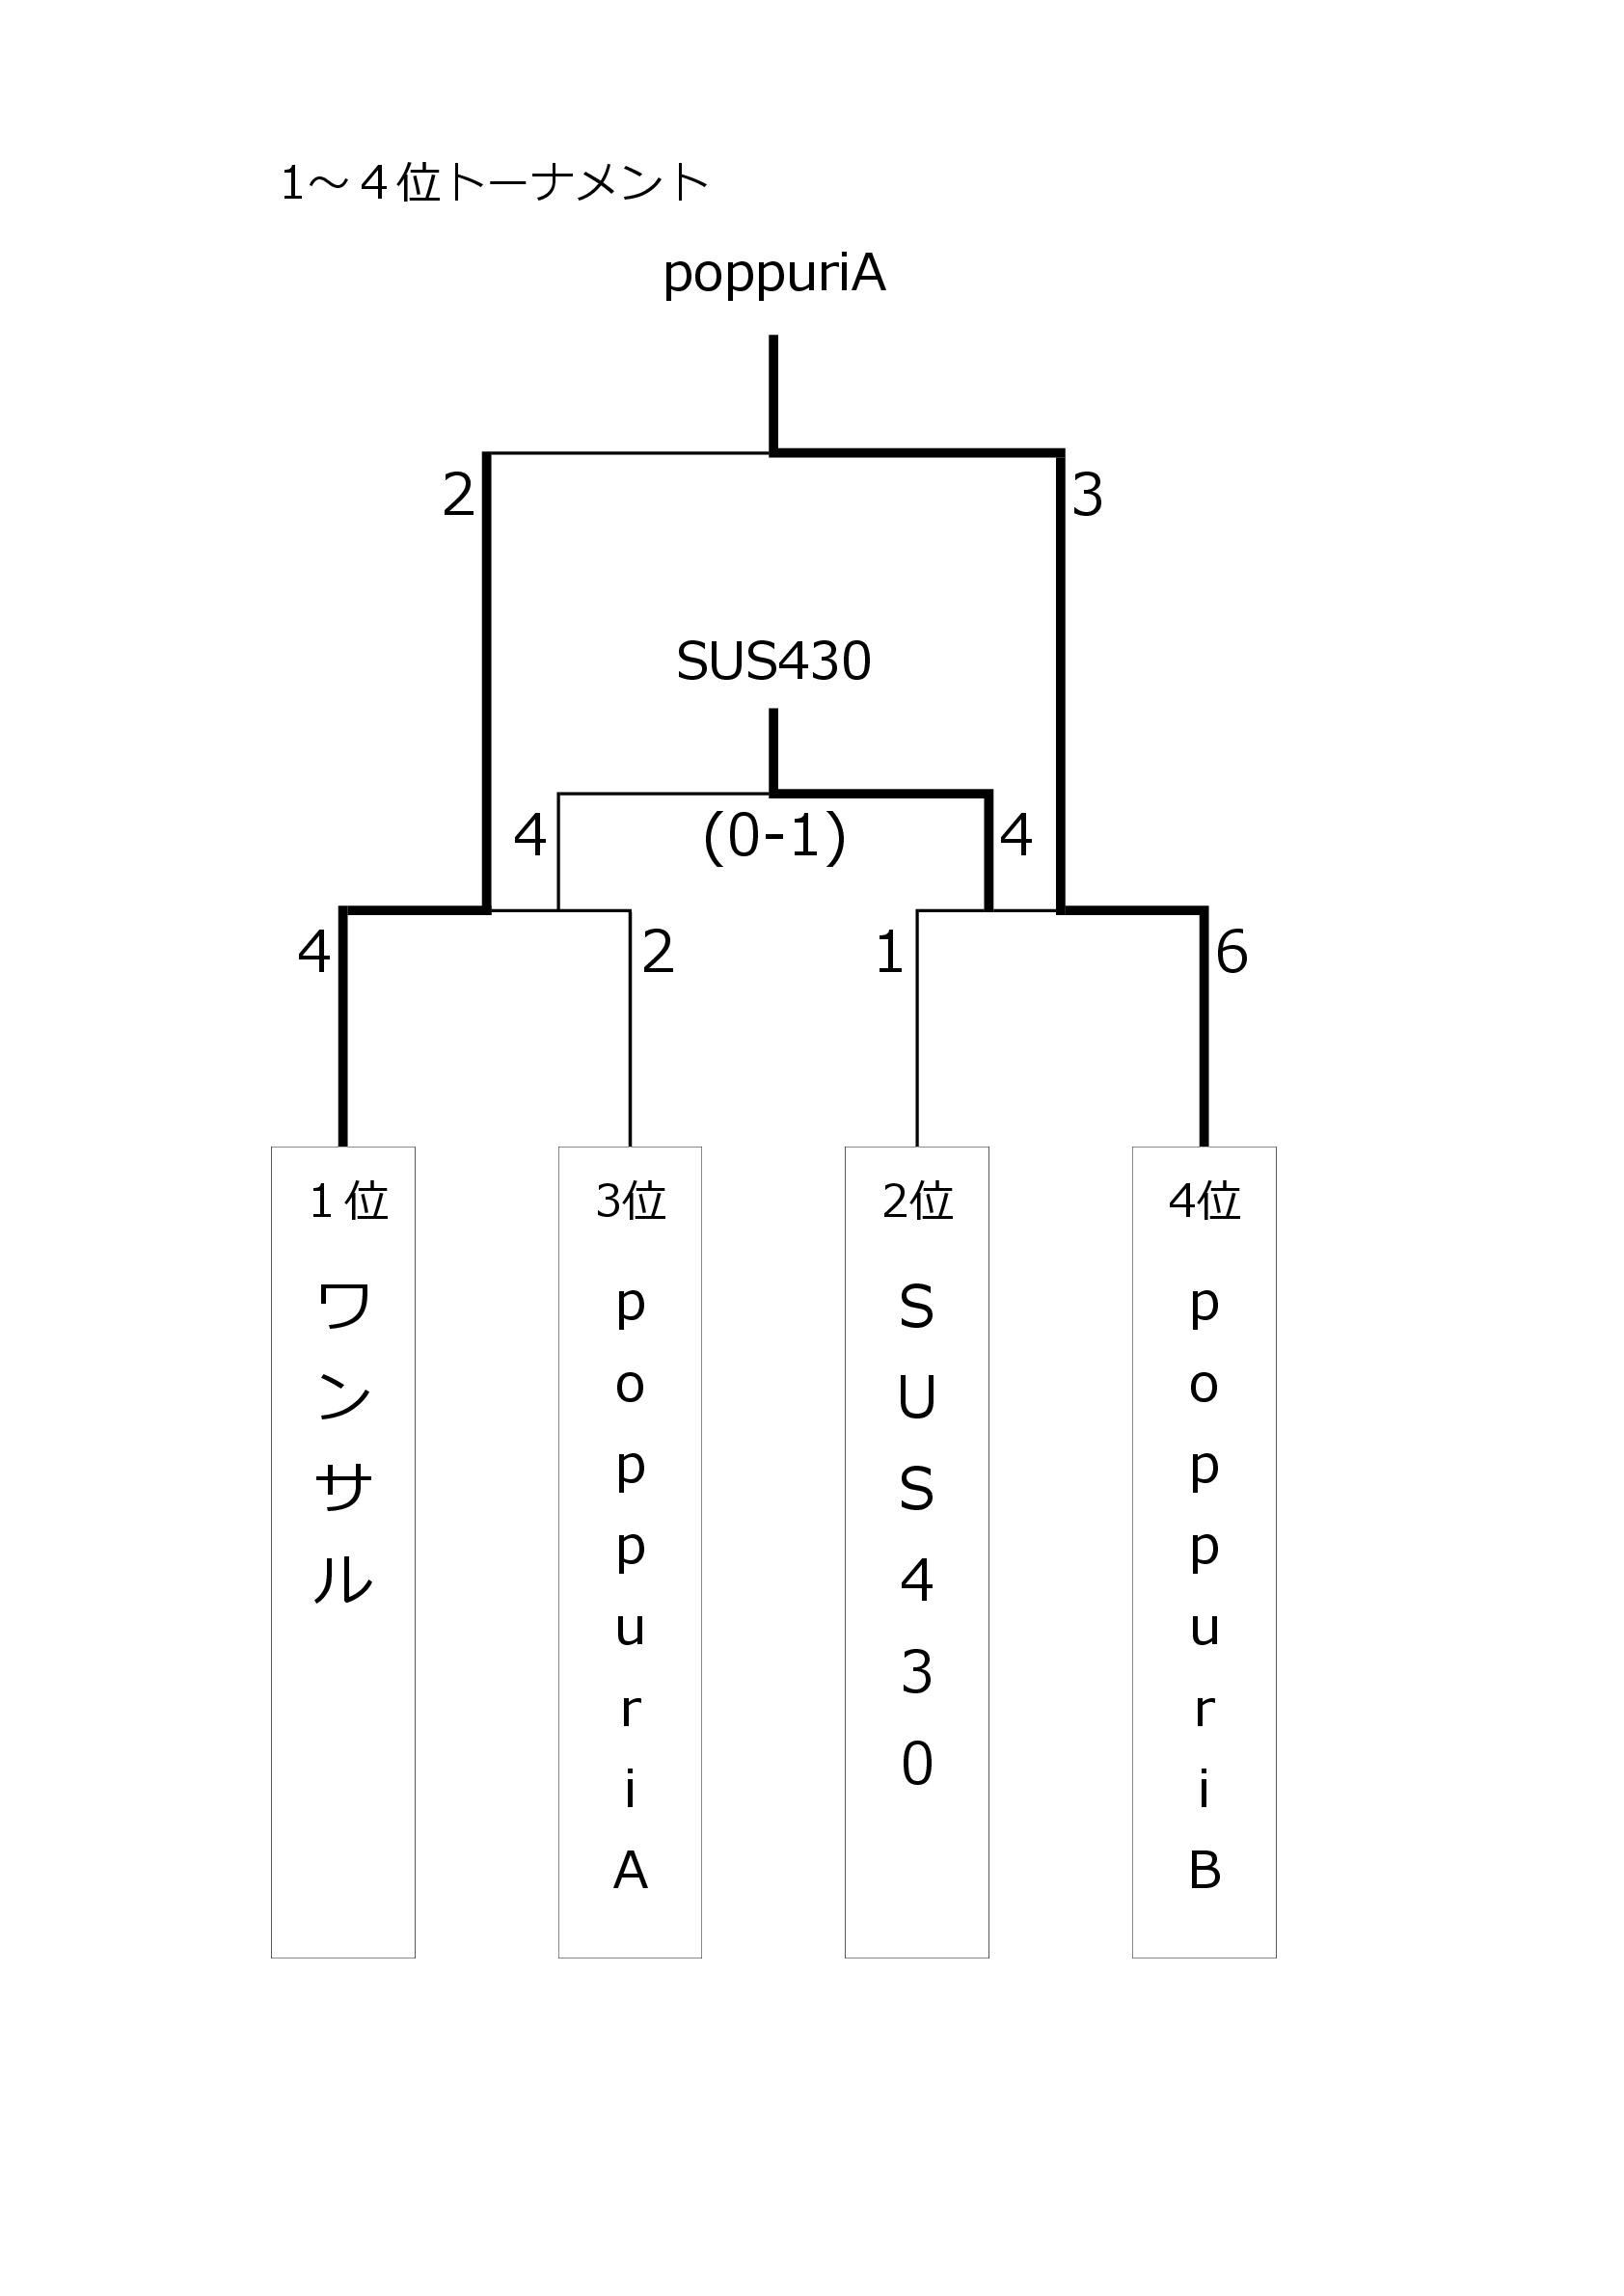 11-5-mix-cup%ef%bd%9e%e4%b8%ad%e7%b4%9a%ef%bd%9e2-001